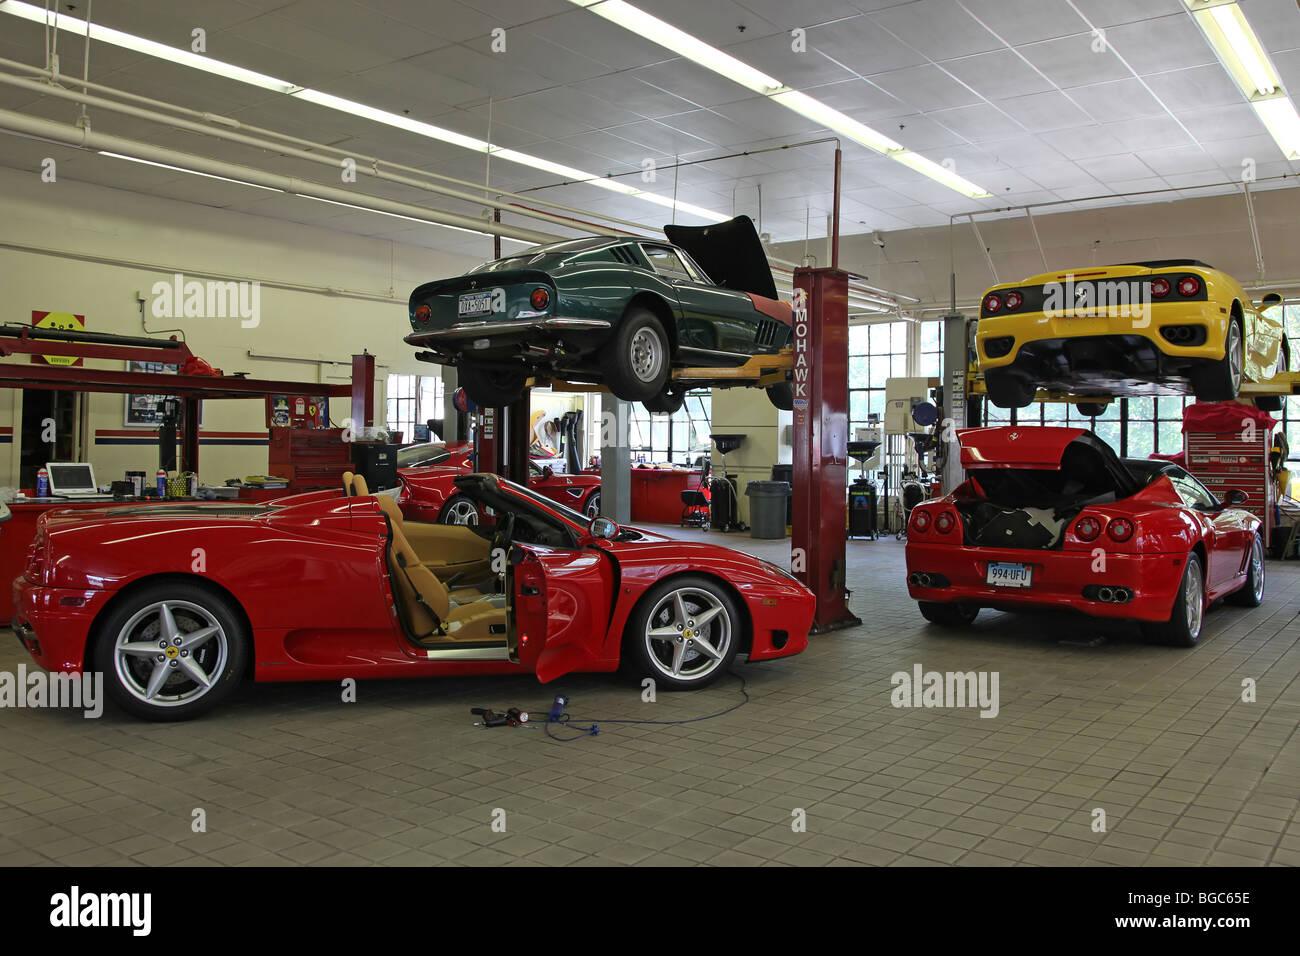 Expensive Exclusive Cars In A Garage Ferrari Porsche